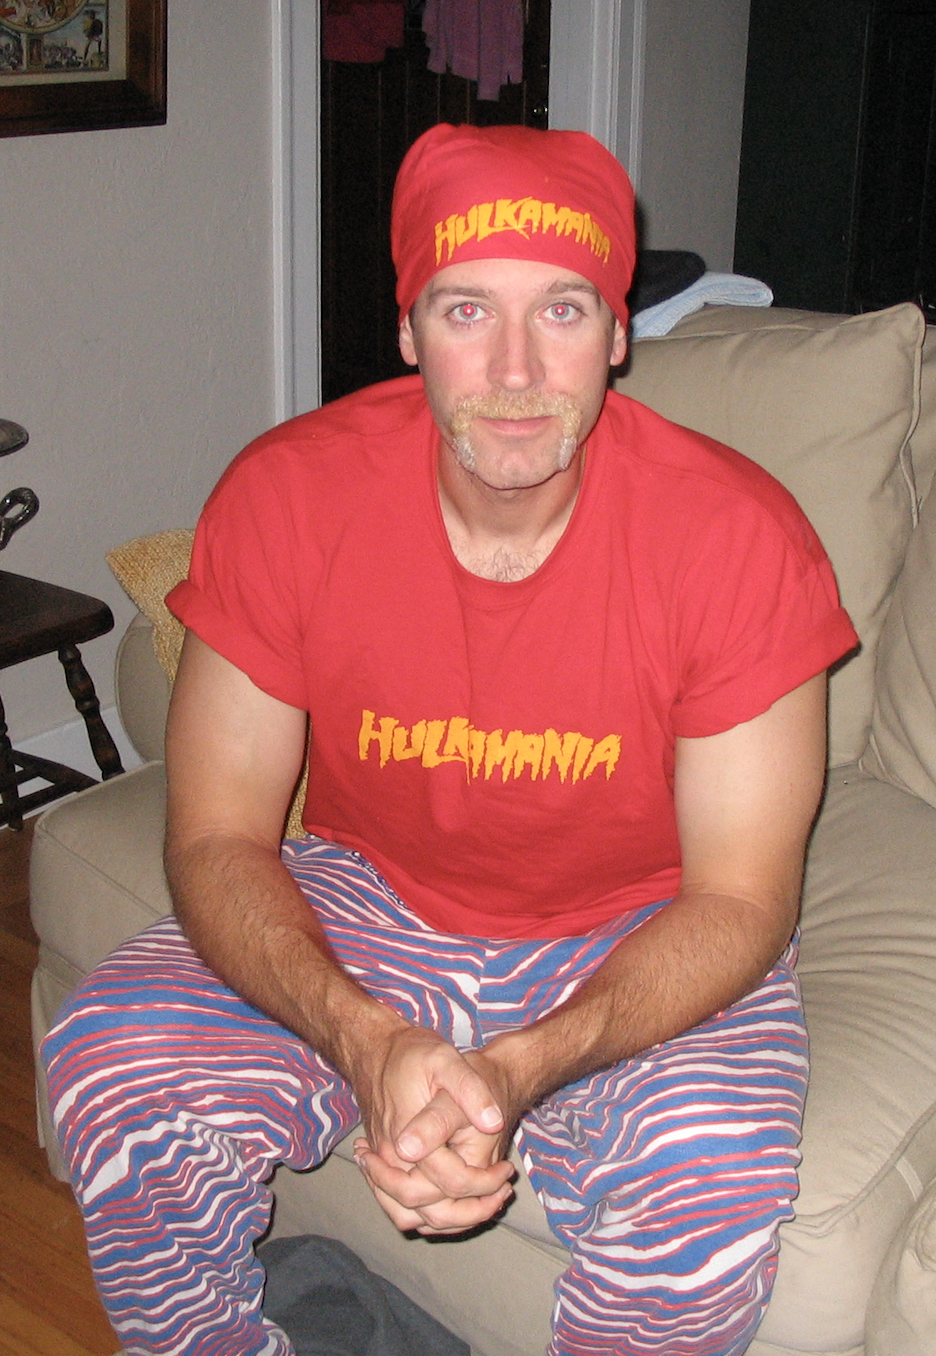 TJ as Hulk Hogan, circa 2005.